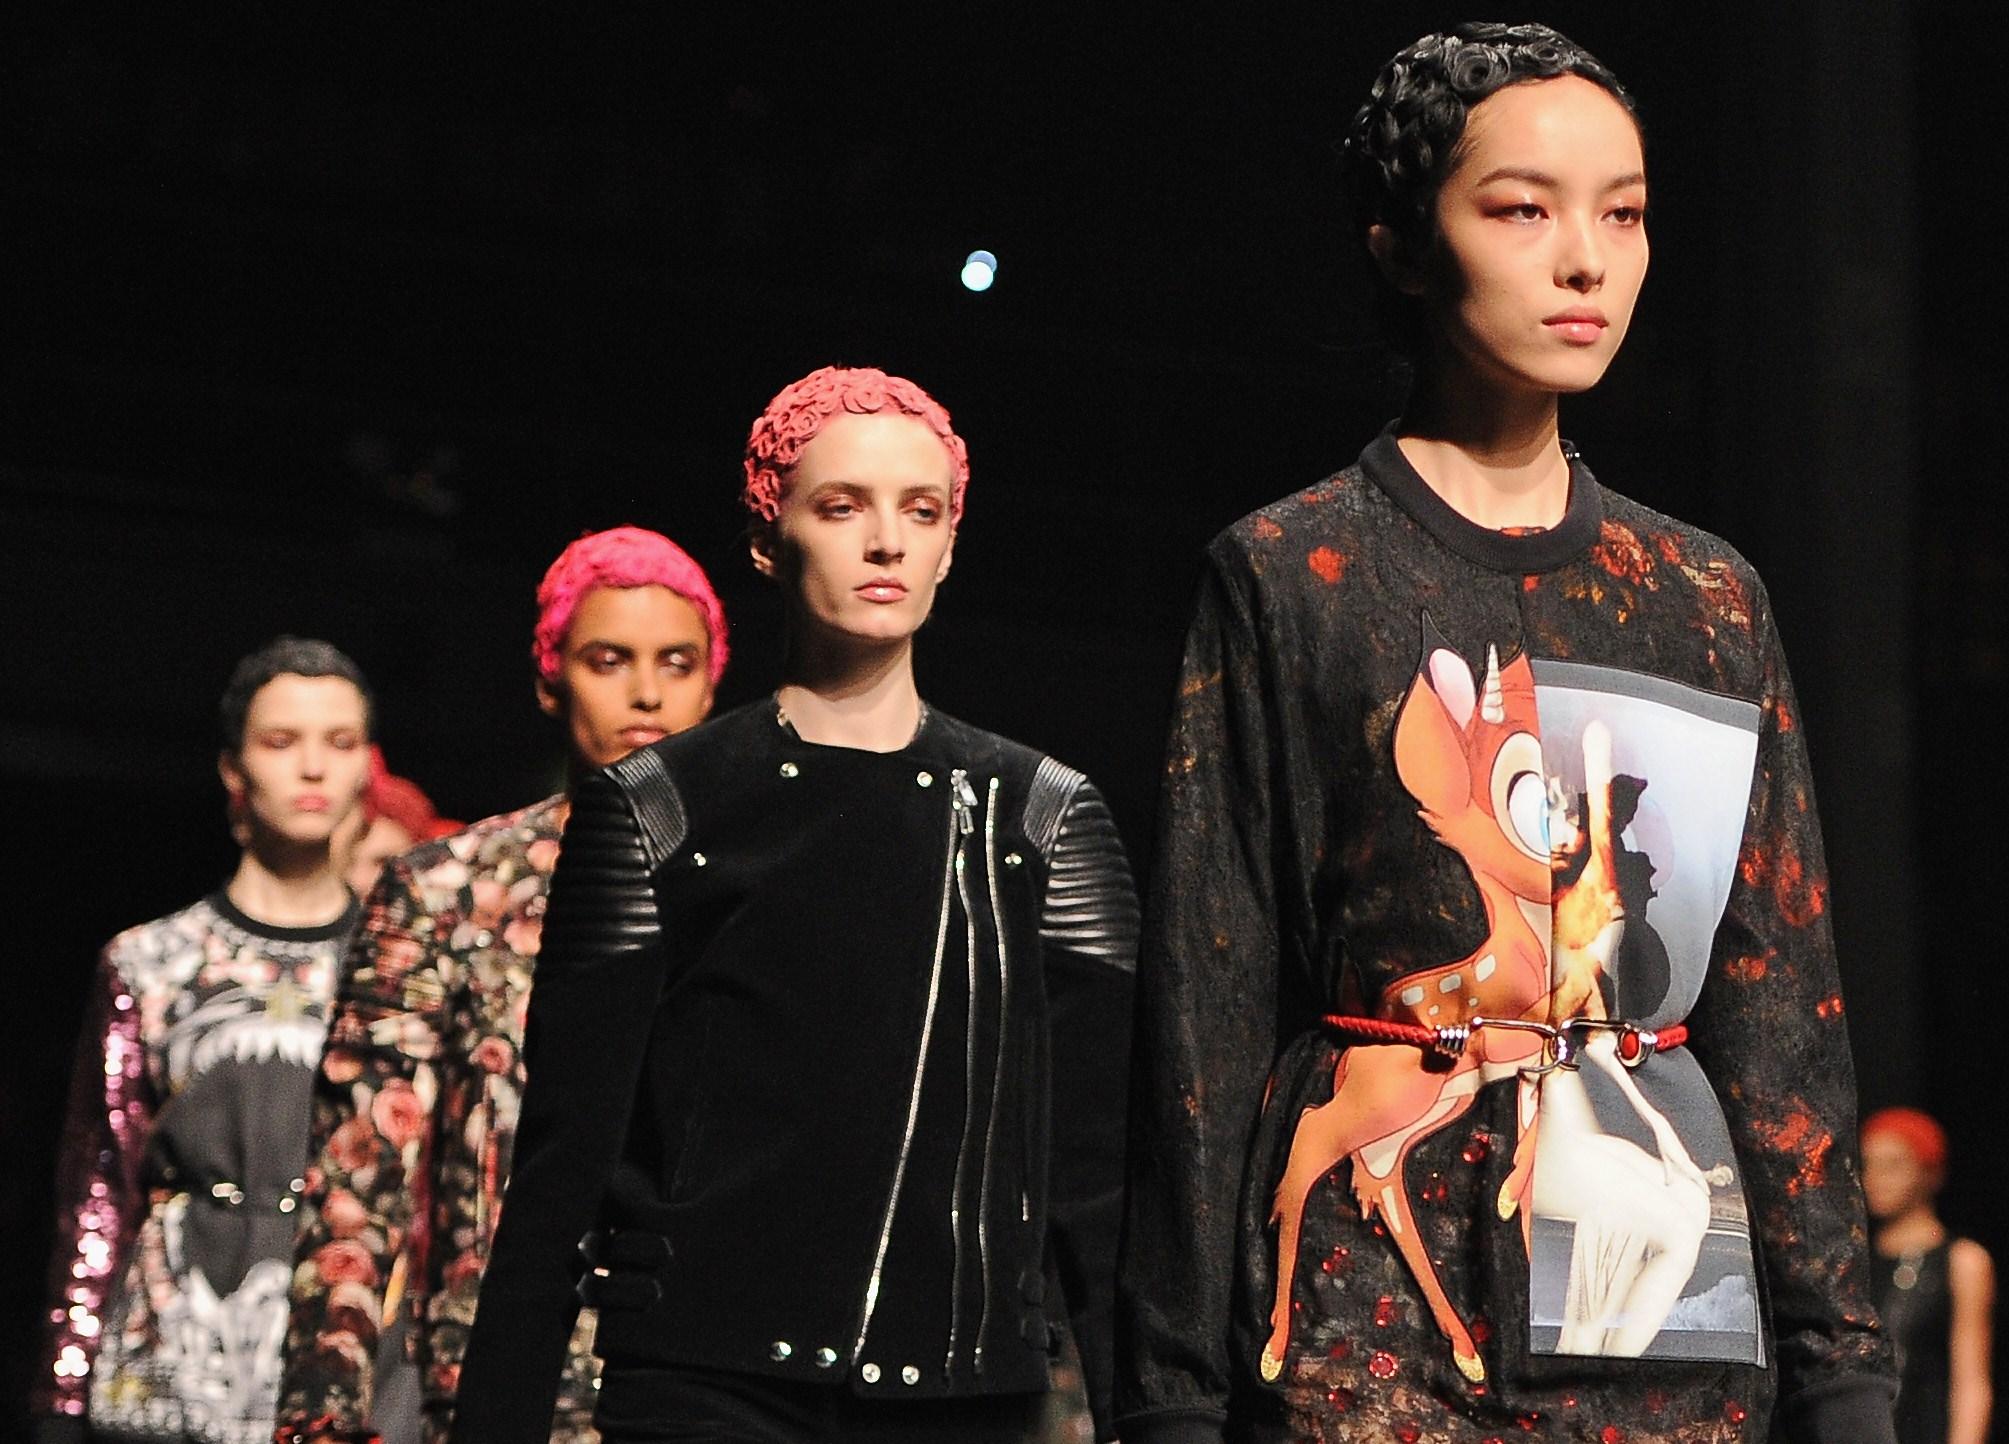 Paris Fashion Week 2013: Givenchy e i personaggi Disney, il punk diviene romantico